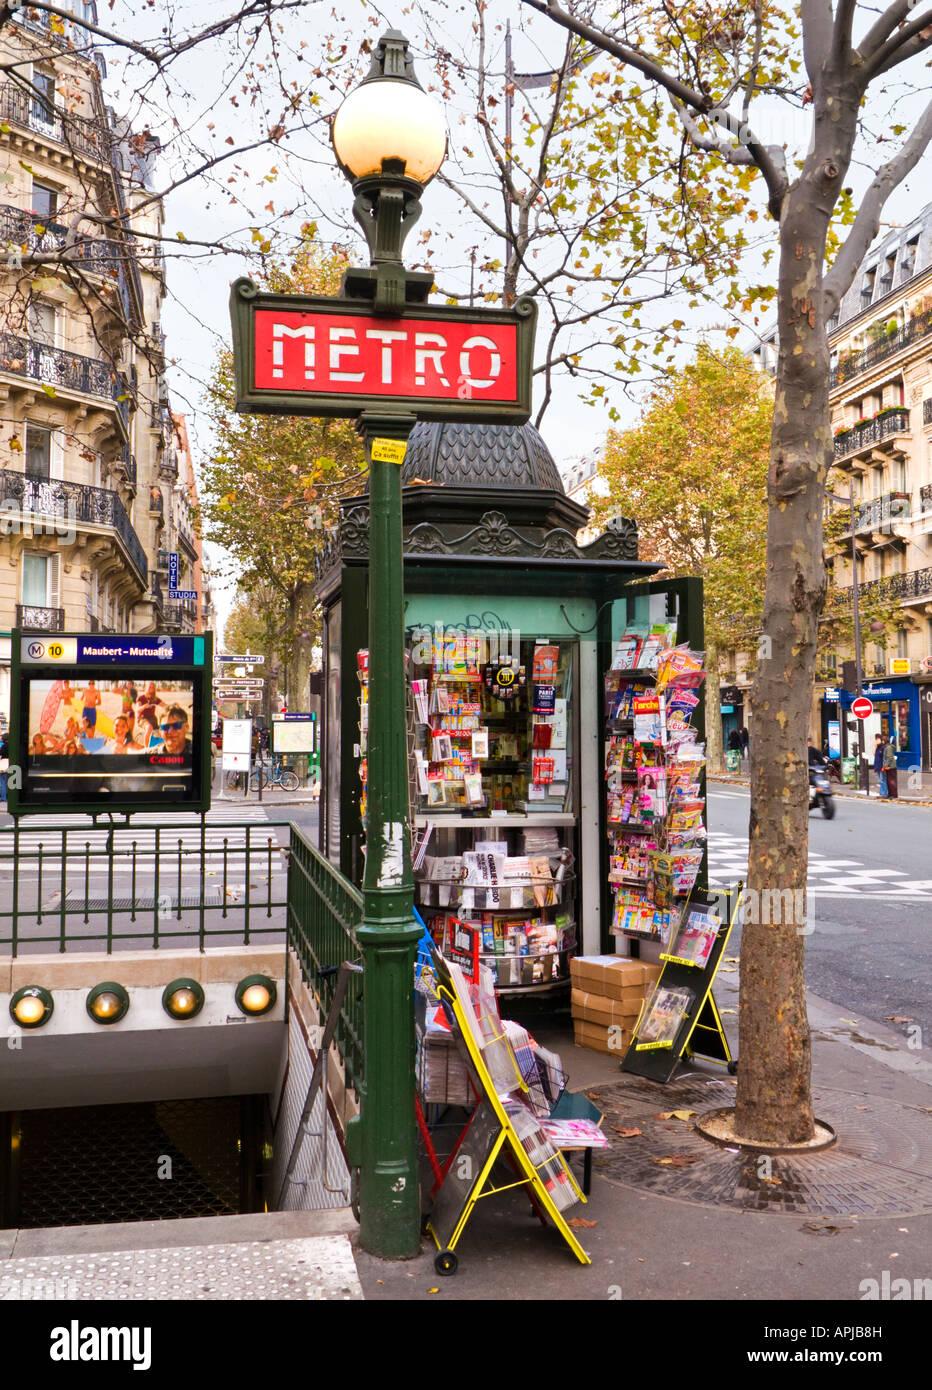 Eingang zur Paris Metro-Station, Place Monge, auf dem Boulevard Saint-Germain Stockbild